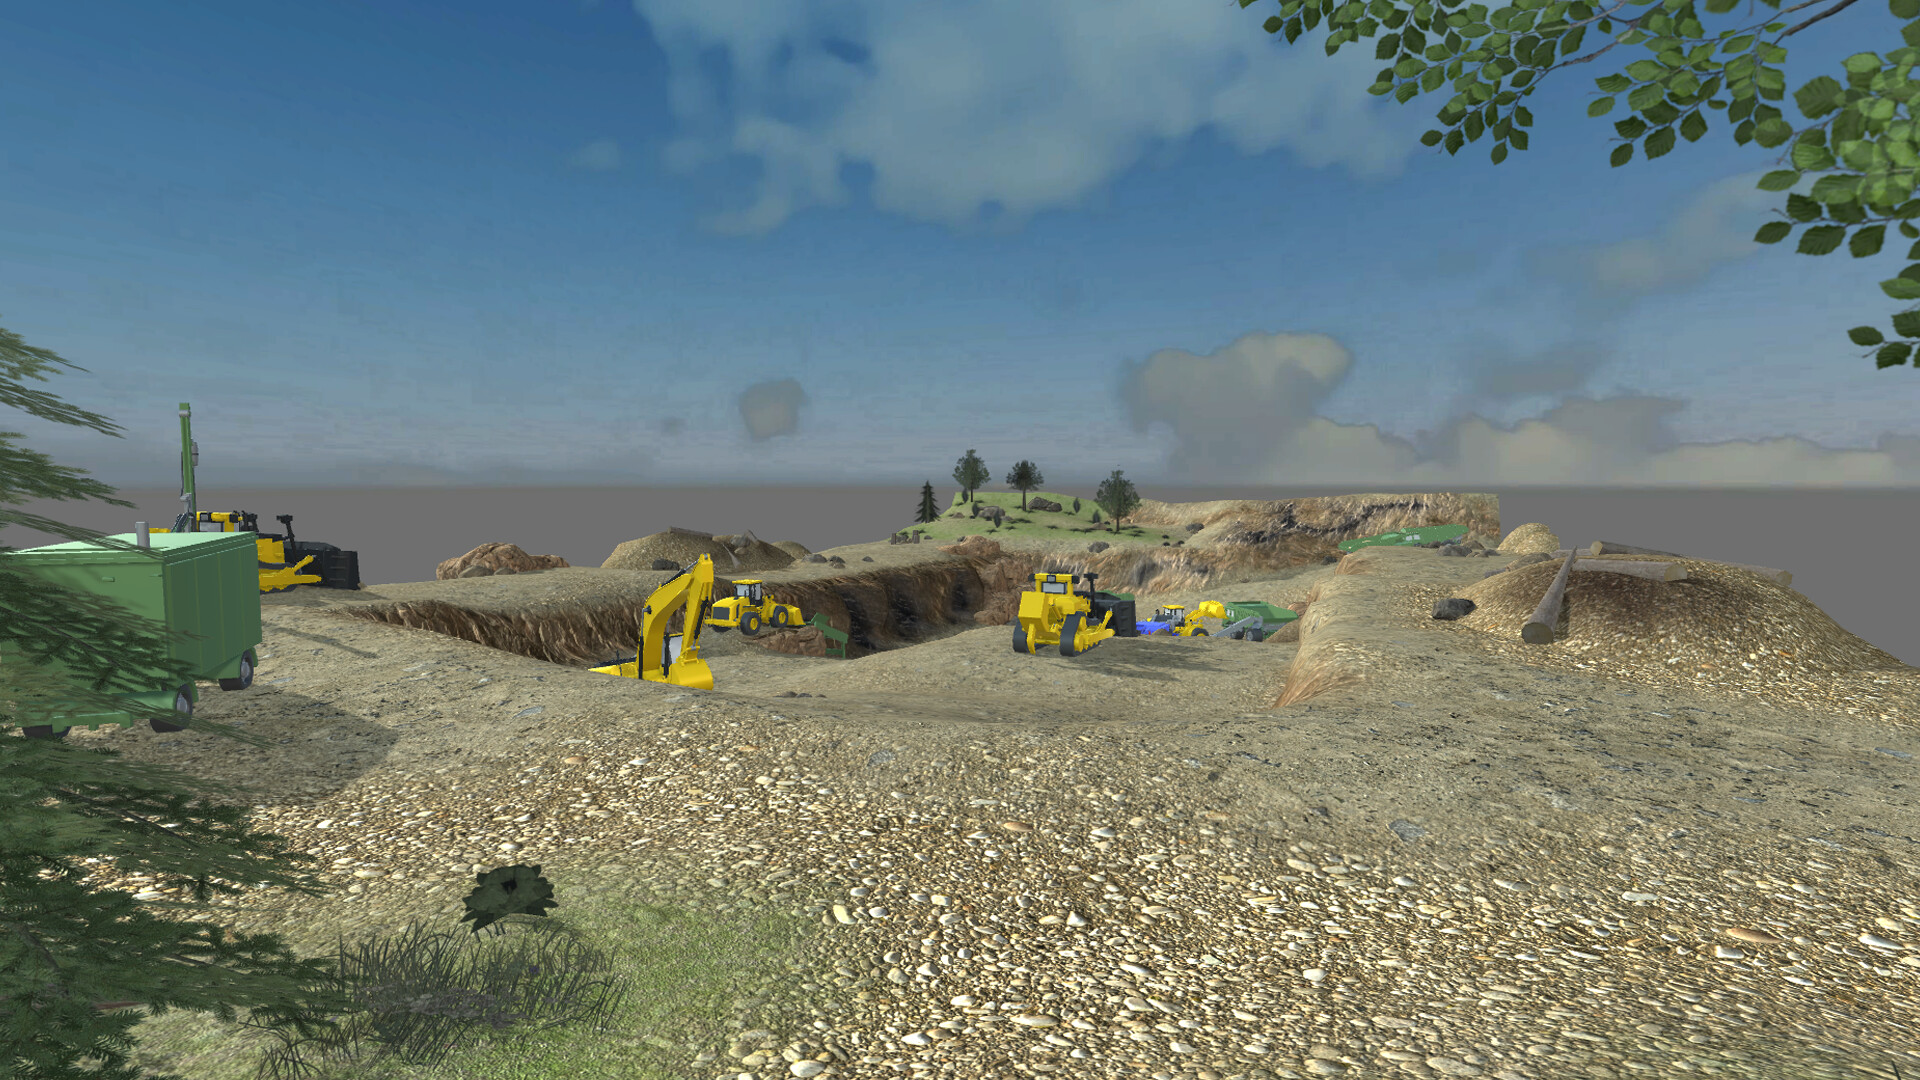 Jordan cameron quarry 10